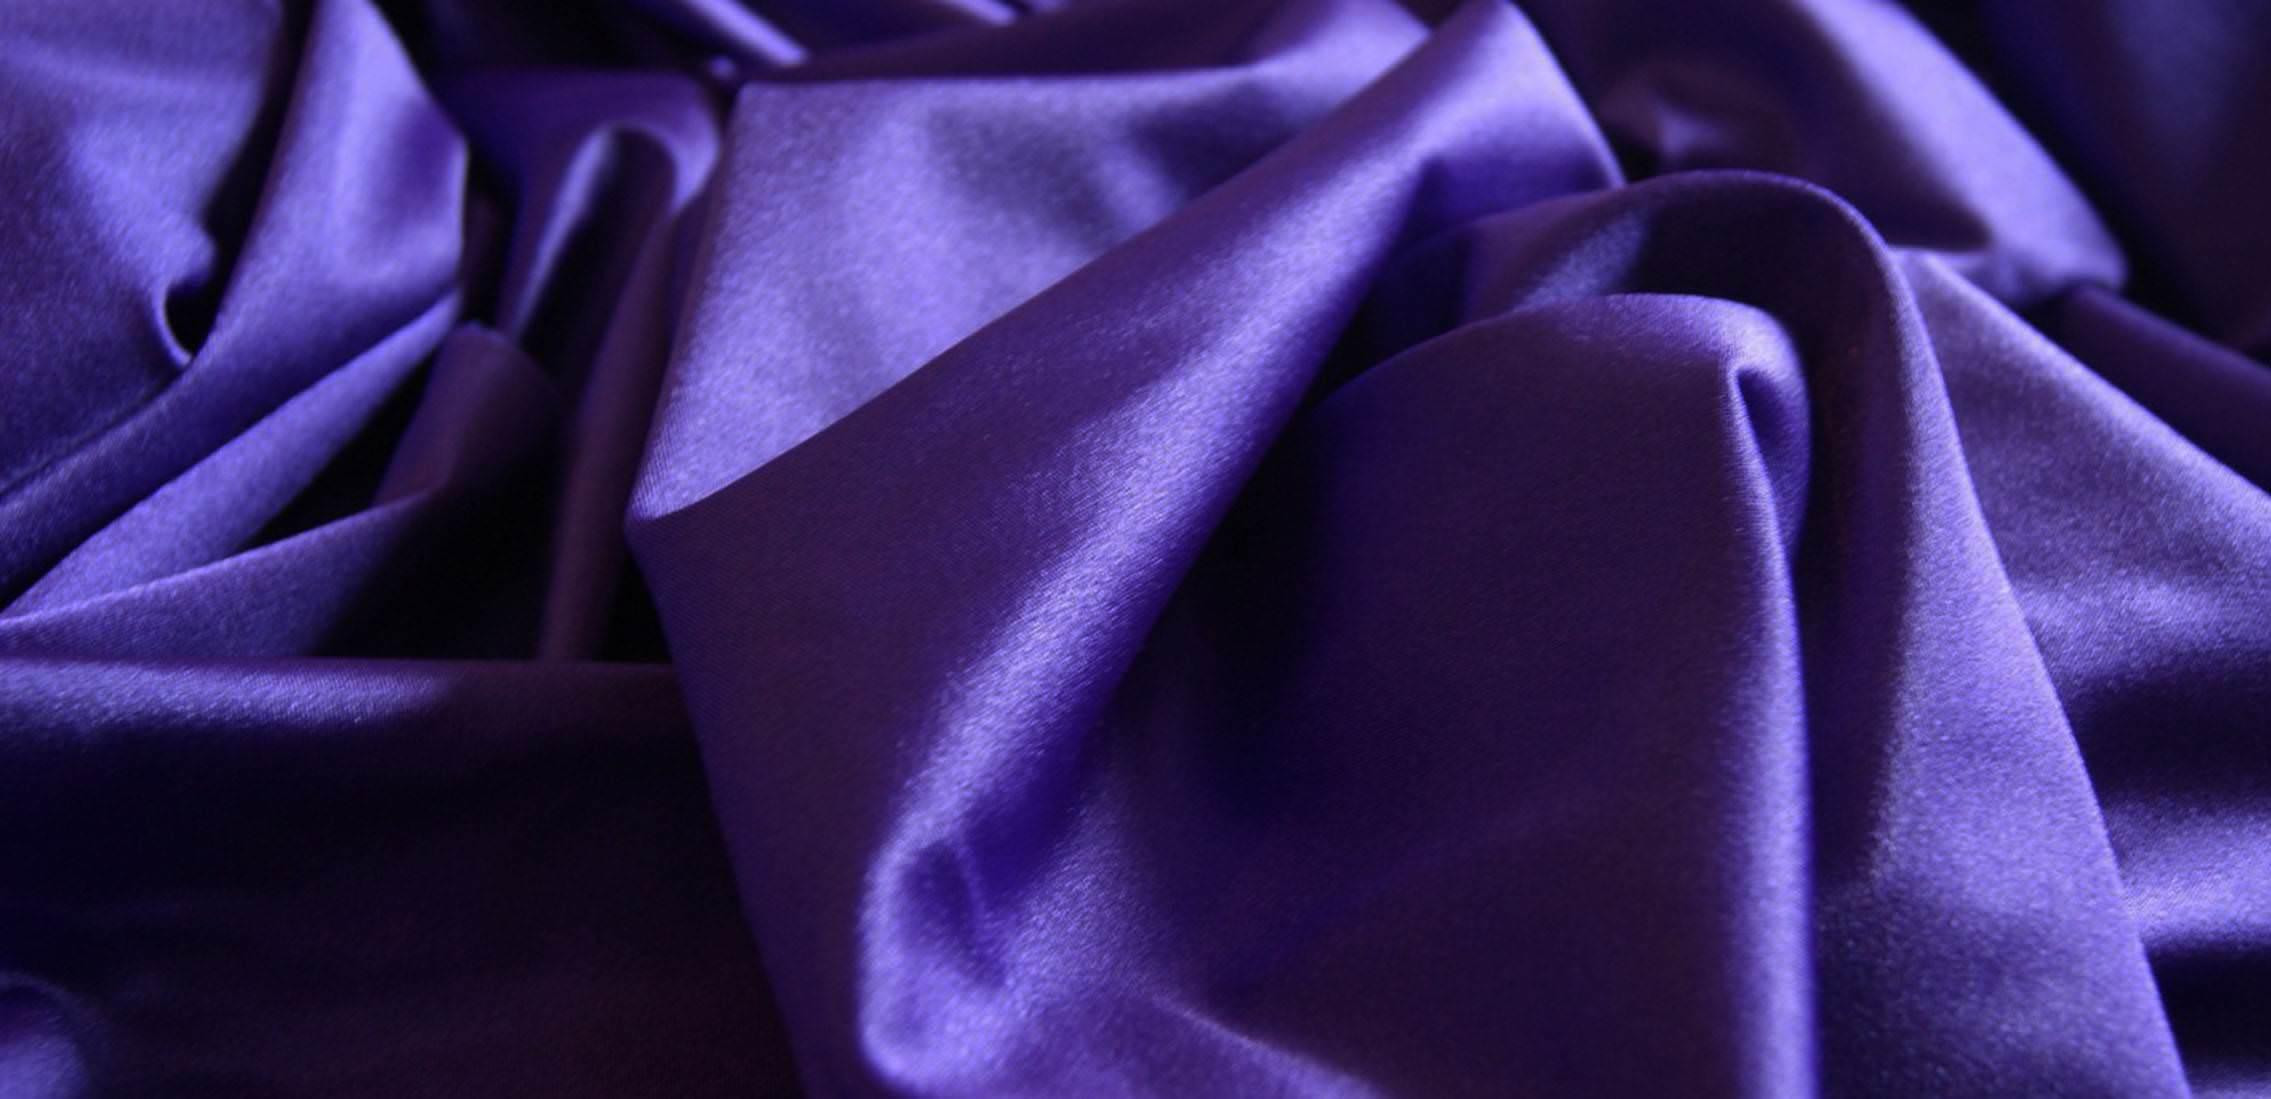 Lycra Fabric Shiny Buy Swimsuit Fabric Online